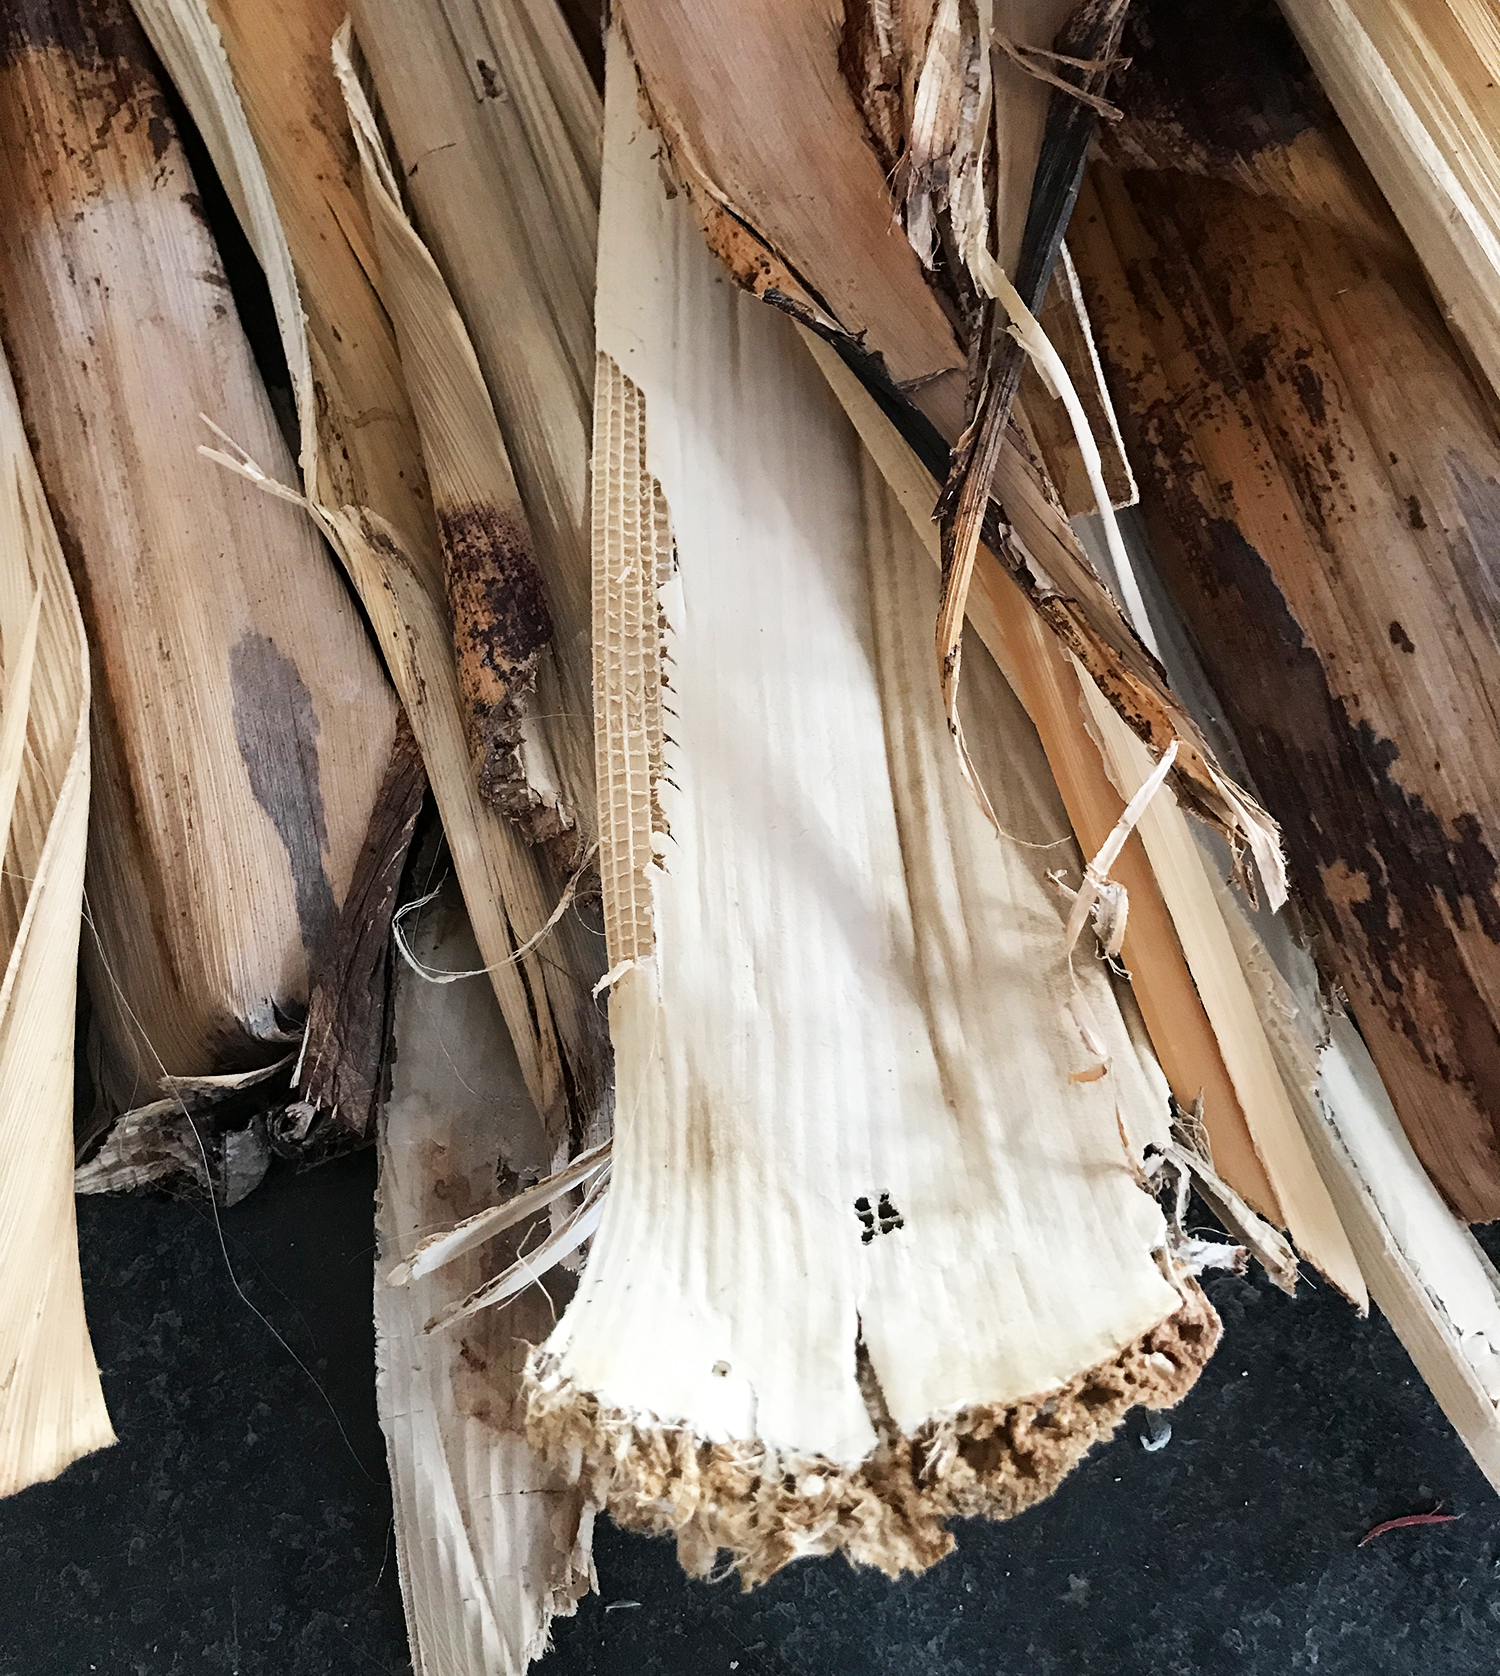 Banana bark, the raw material for basket weaving.